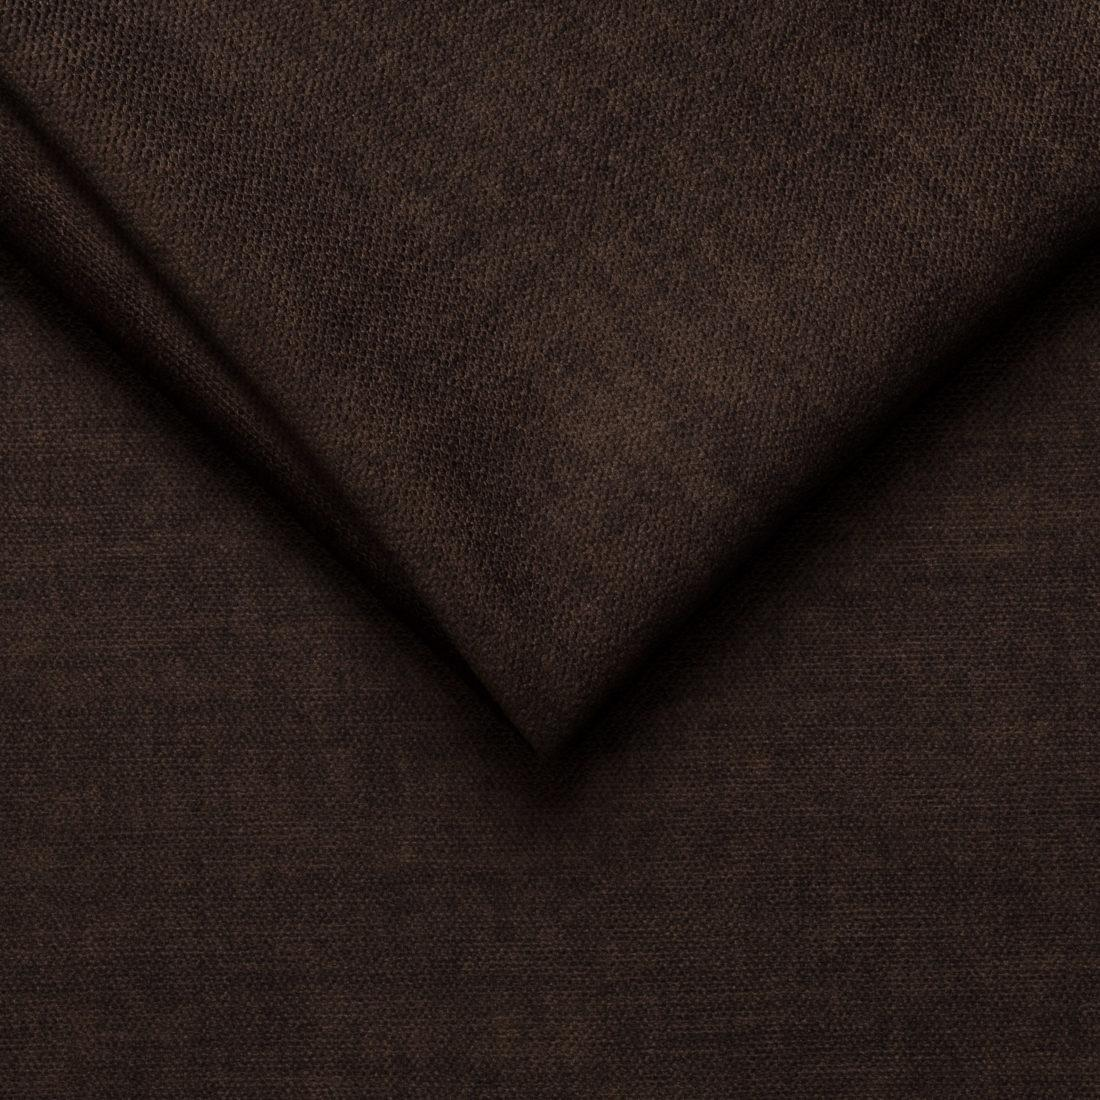 Меблева тканина Vogue 6 Brown, велюр